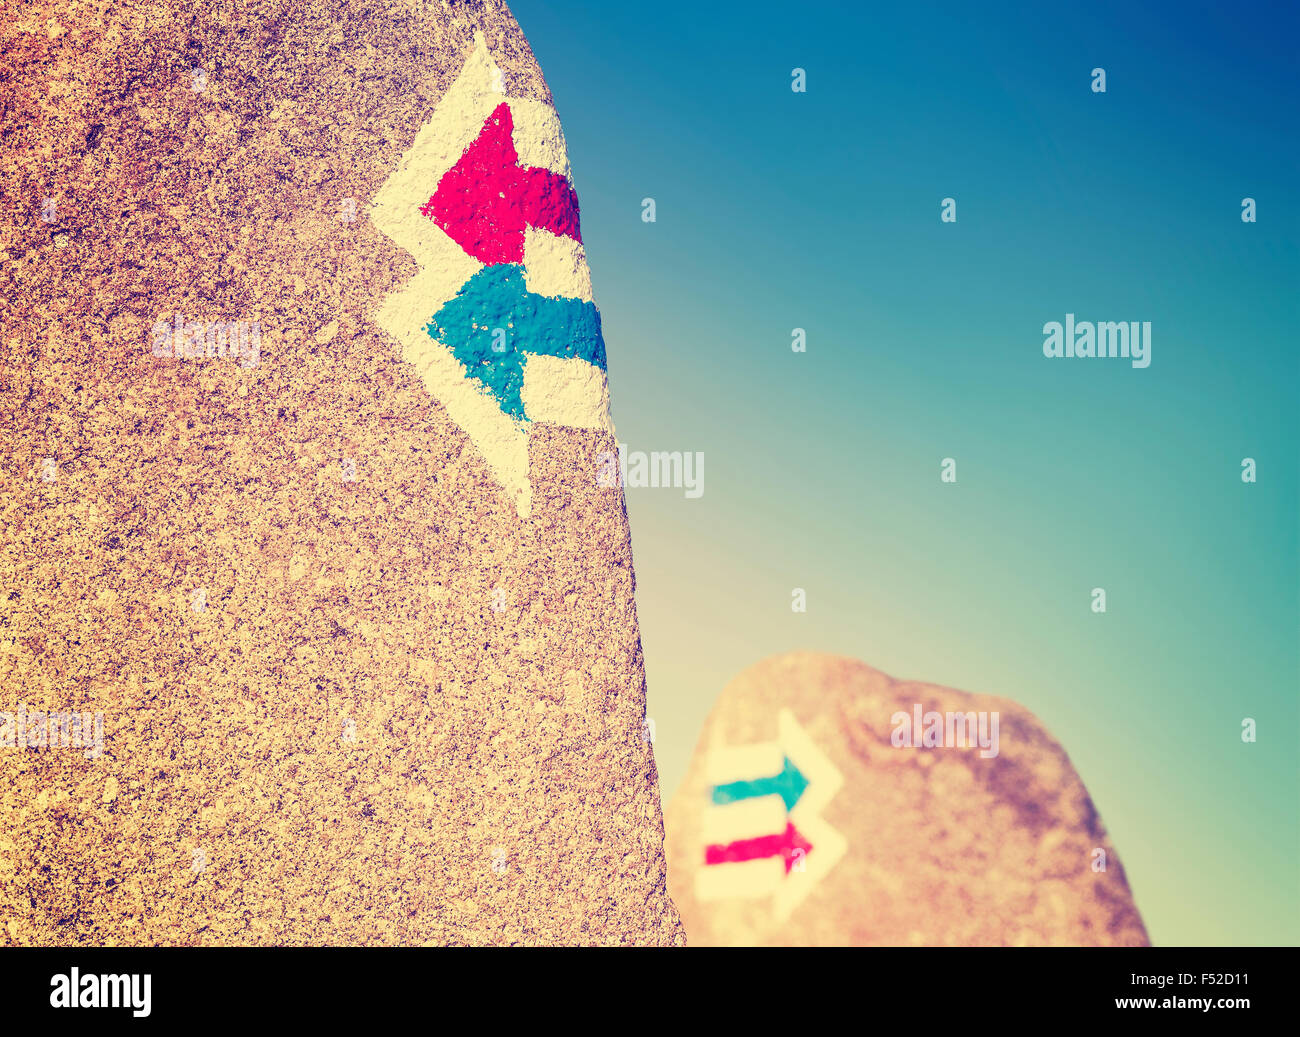 Tonos Vintage trail señales pintadas sobre la roca, opción o dilema concepto. Imagen De Stock